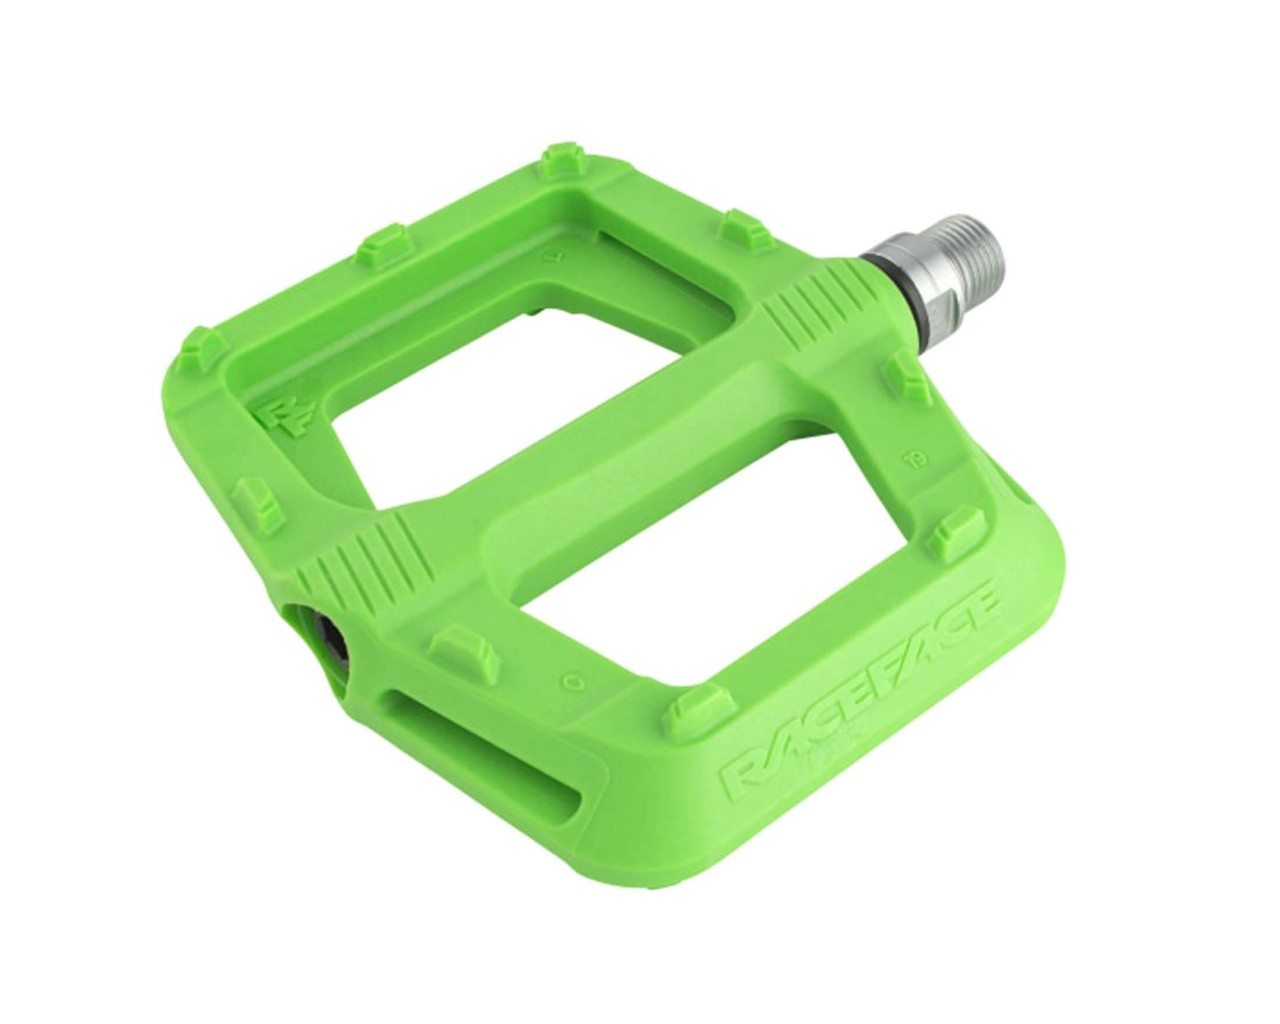 Race Face Ride Composite Platform Pedals (Pair) | green